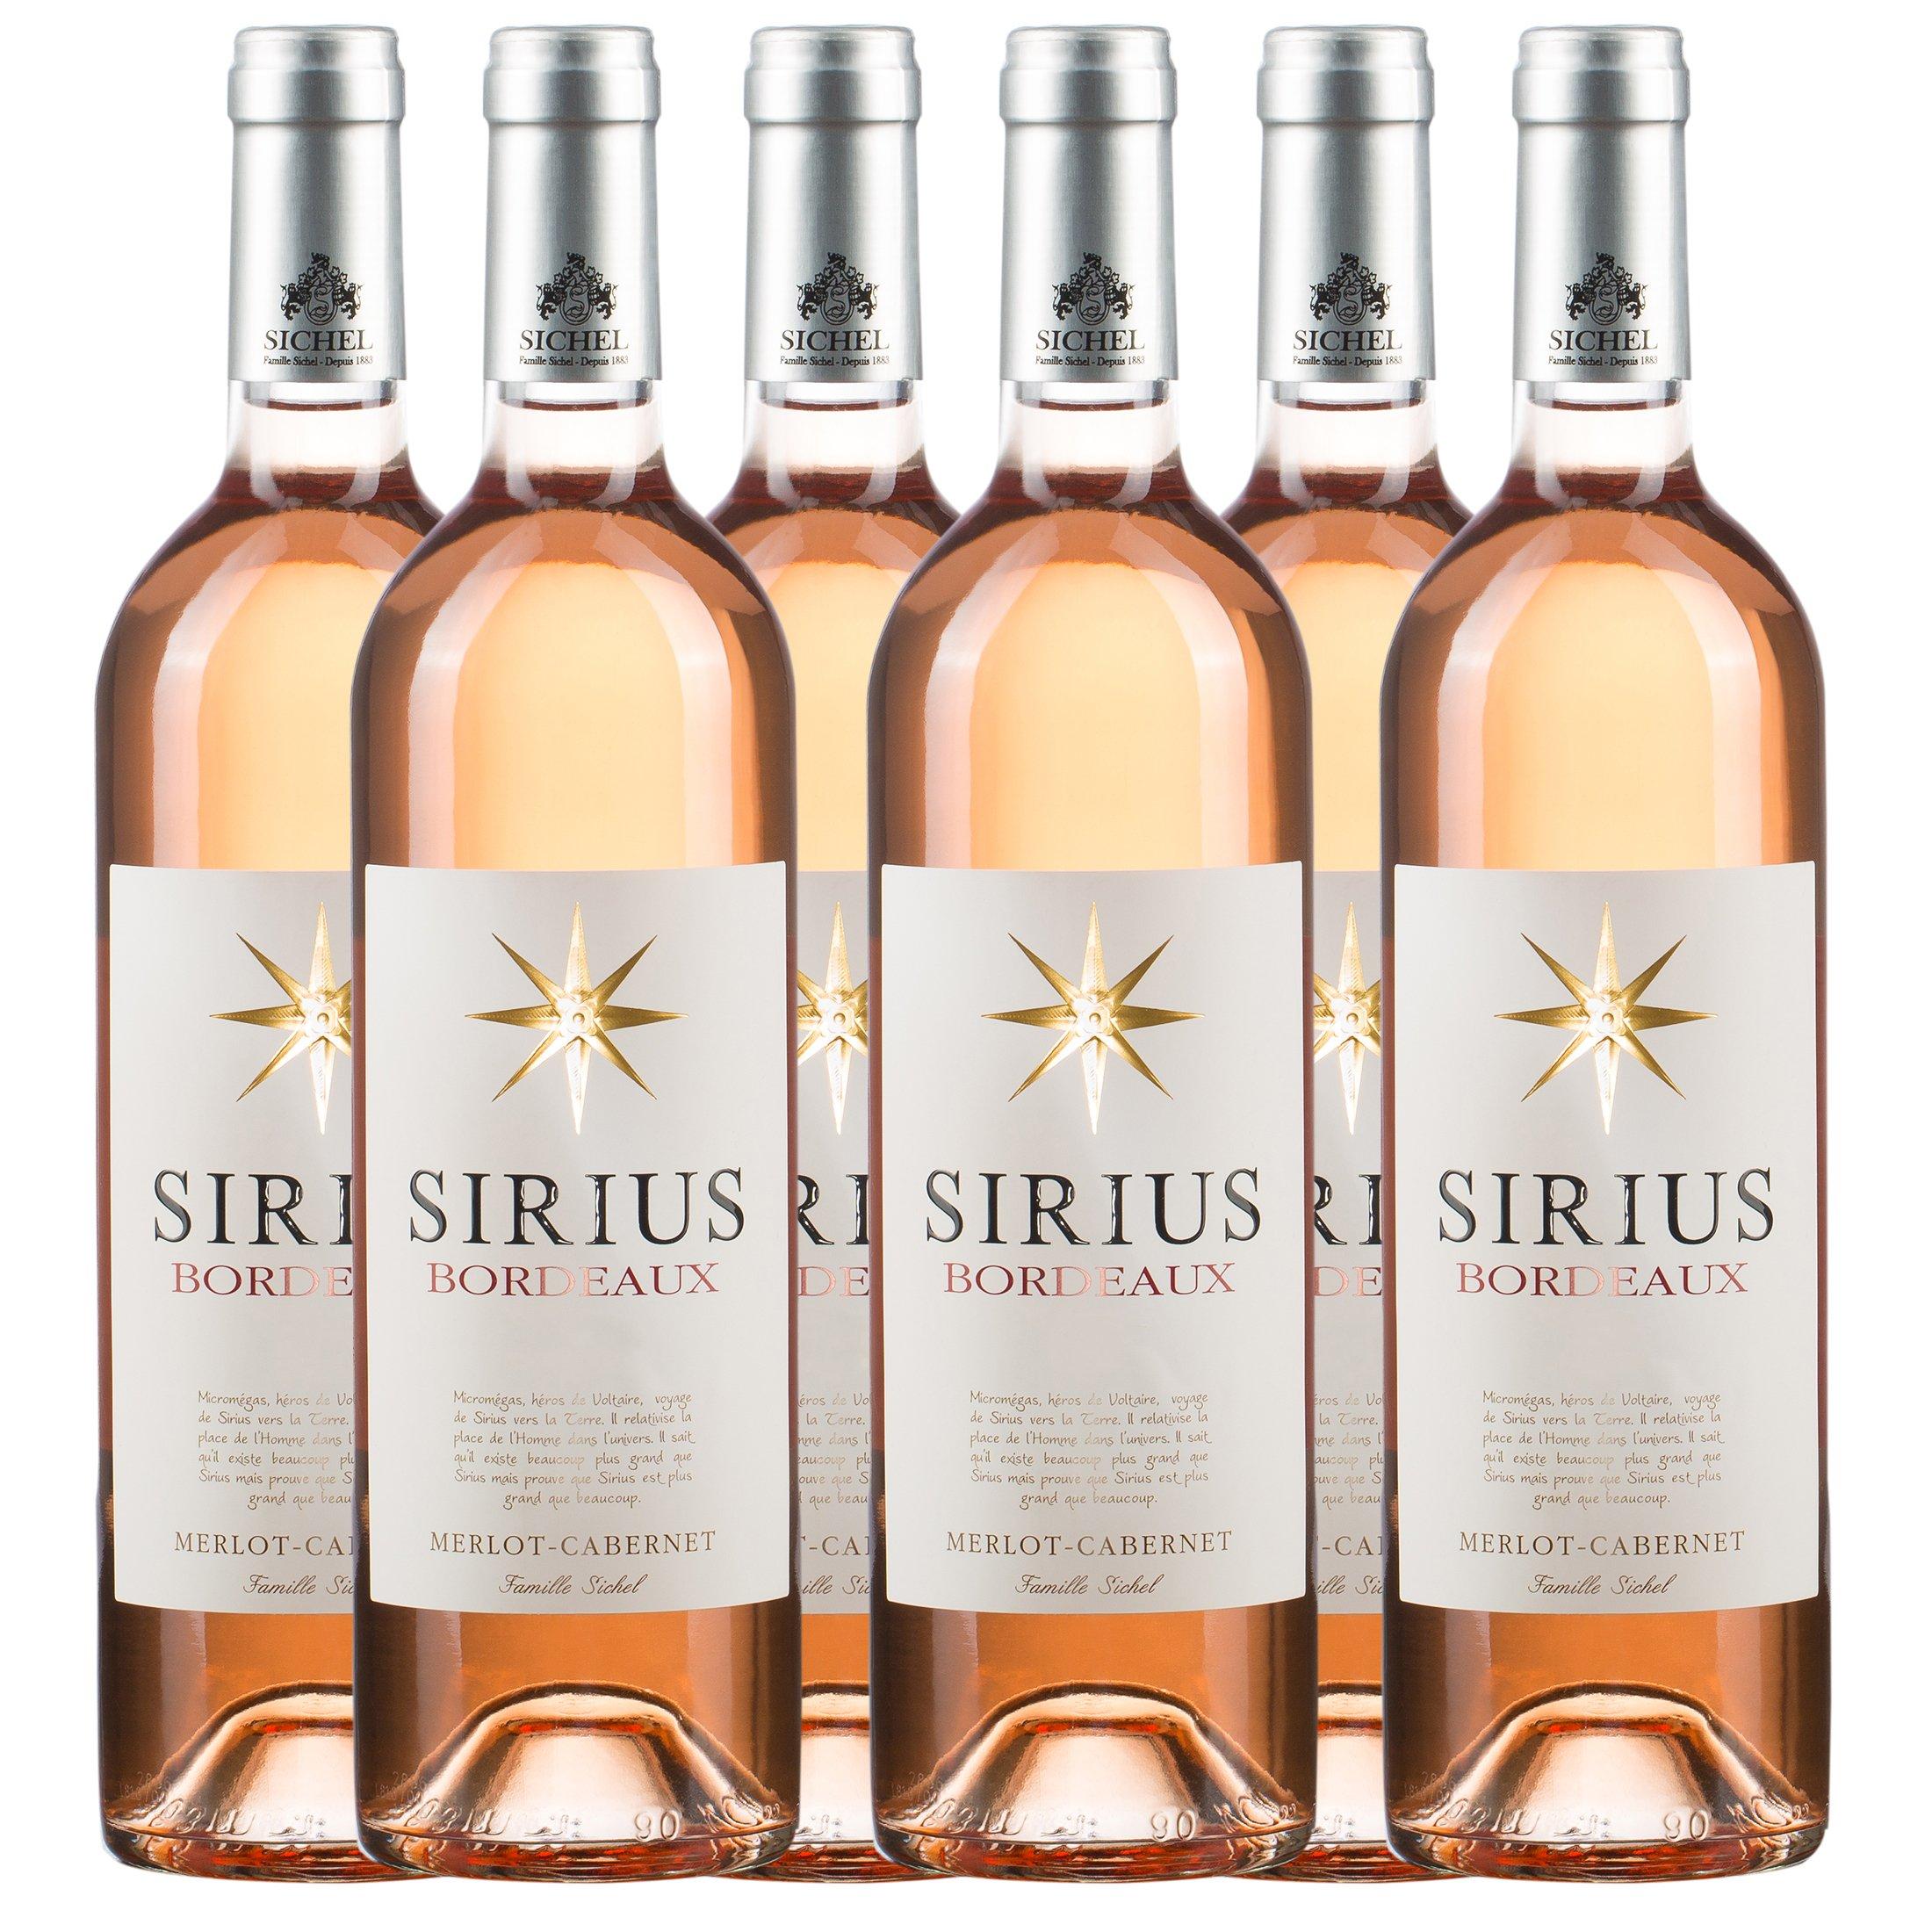 Sander's Selection Sirius Vino Rosado - Paquete de 6 x 750 ml - Total: 4500 ml